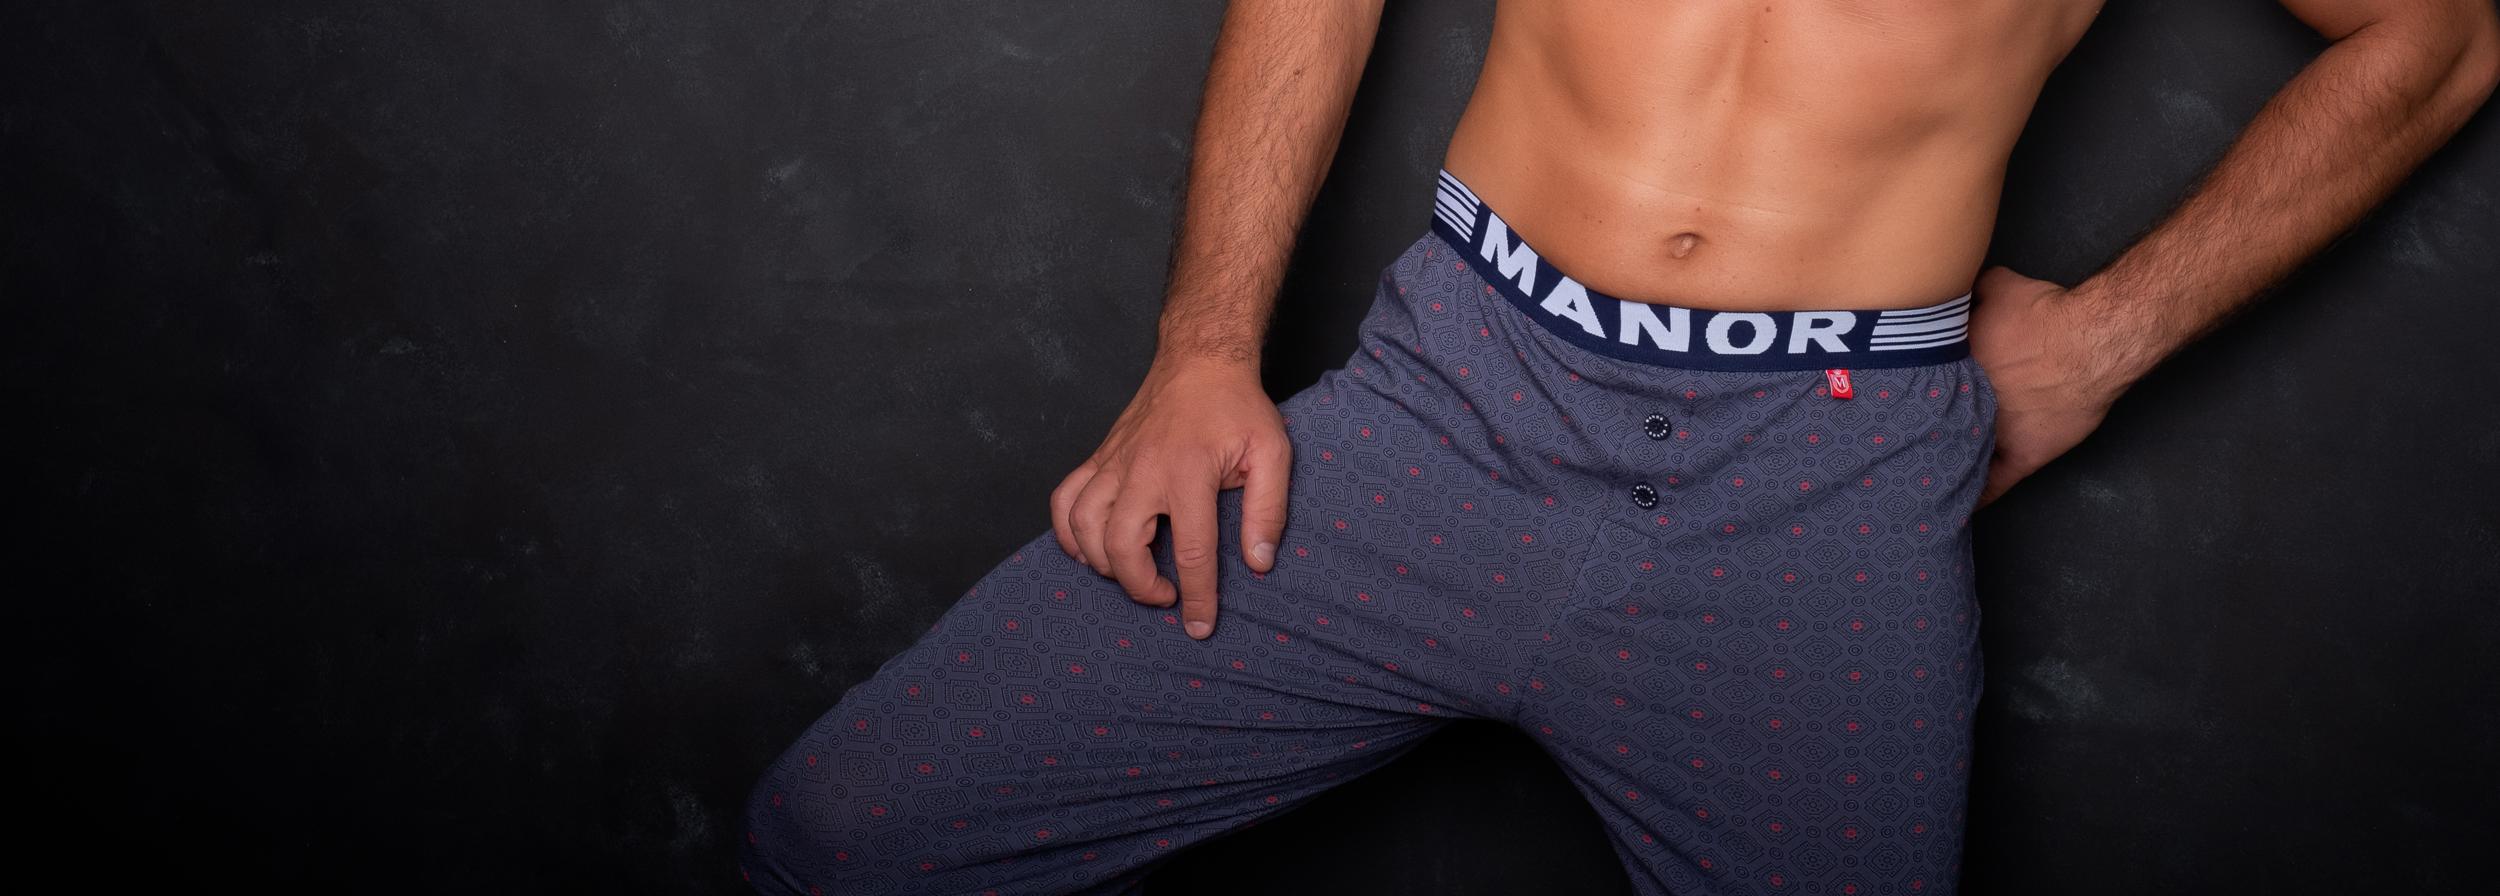 Manor underwear Pidžame naslovna